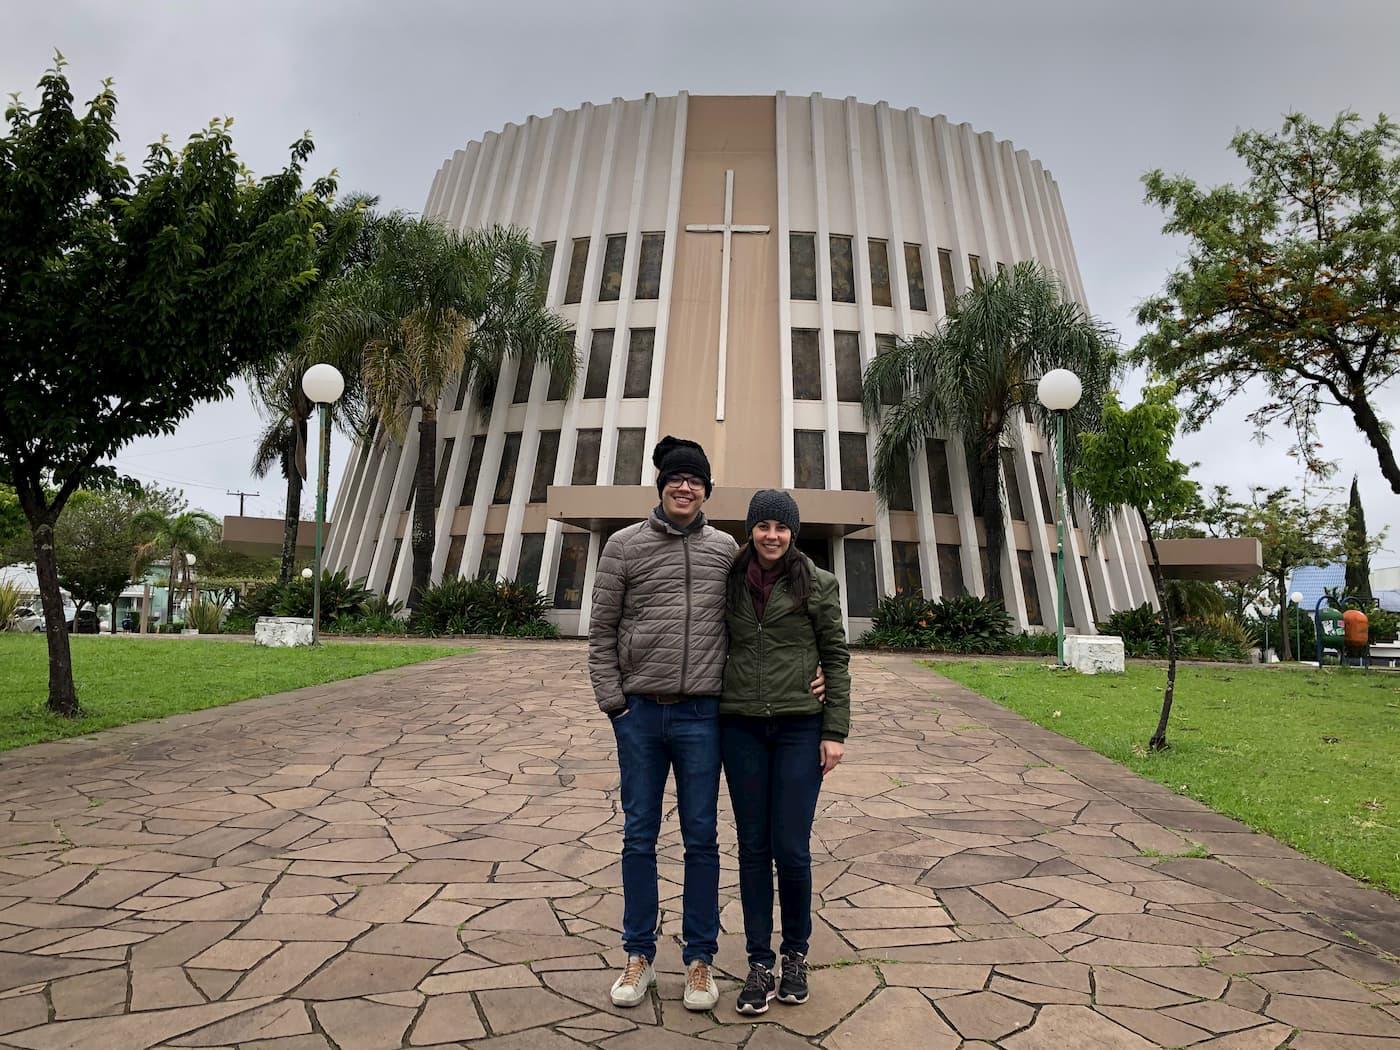 igreja central em bento gonçalves